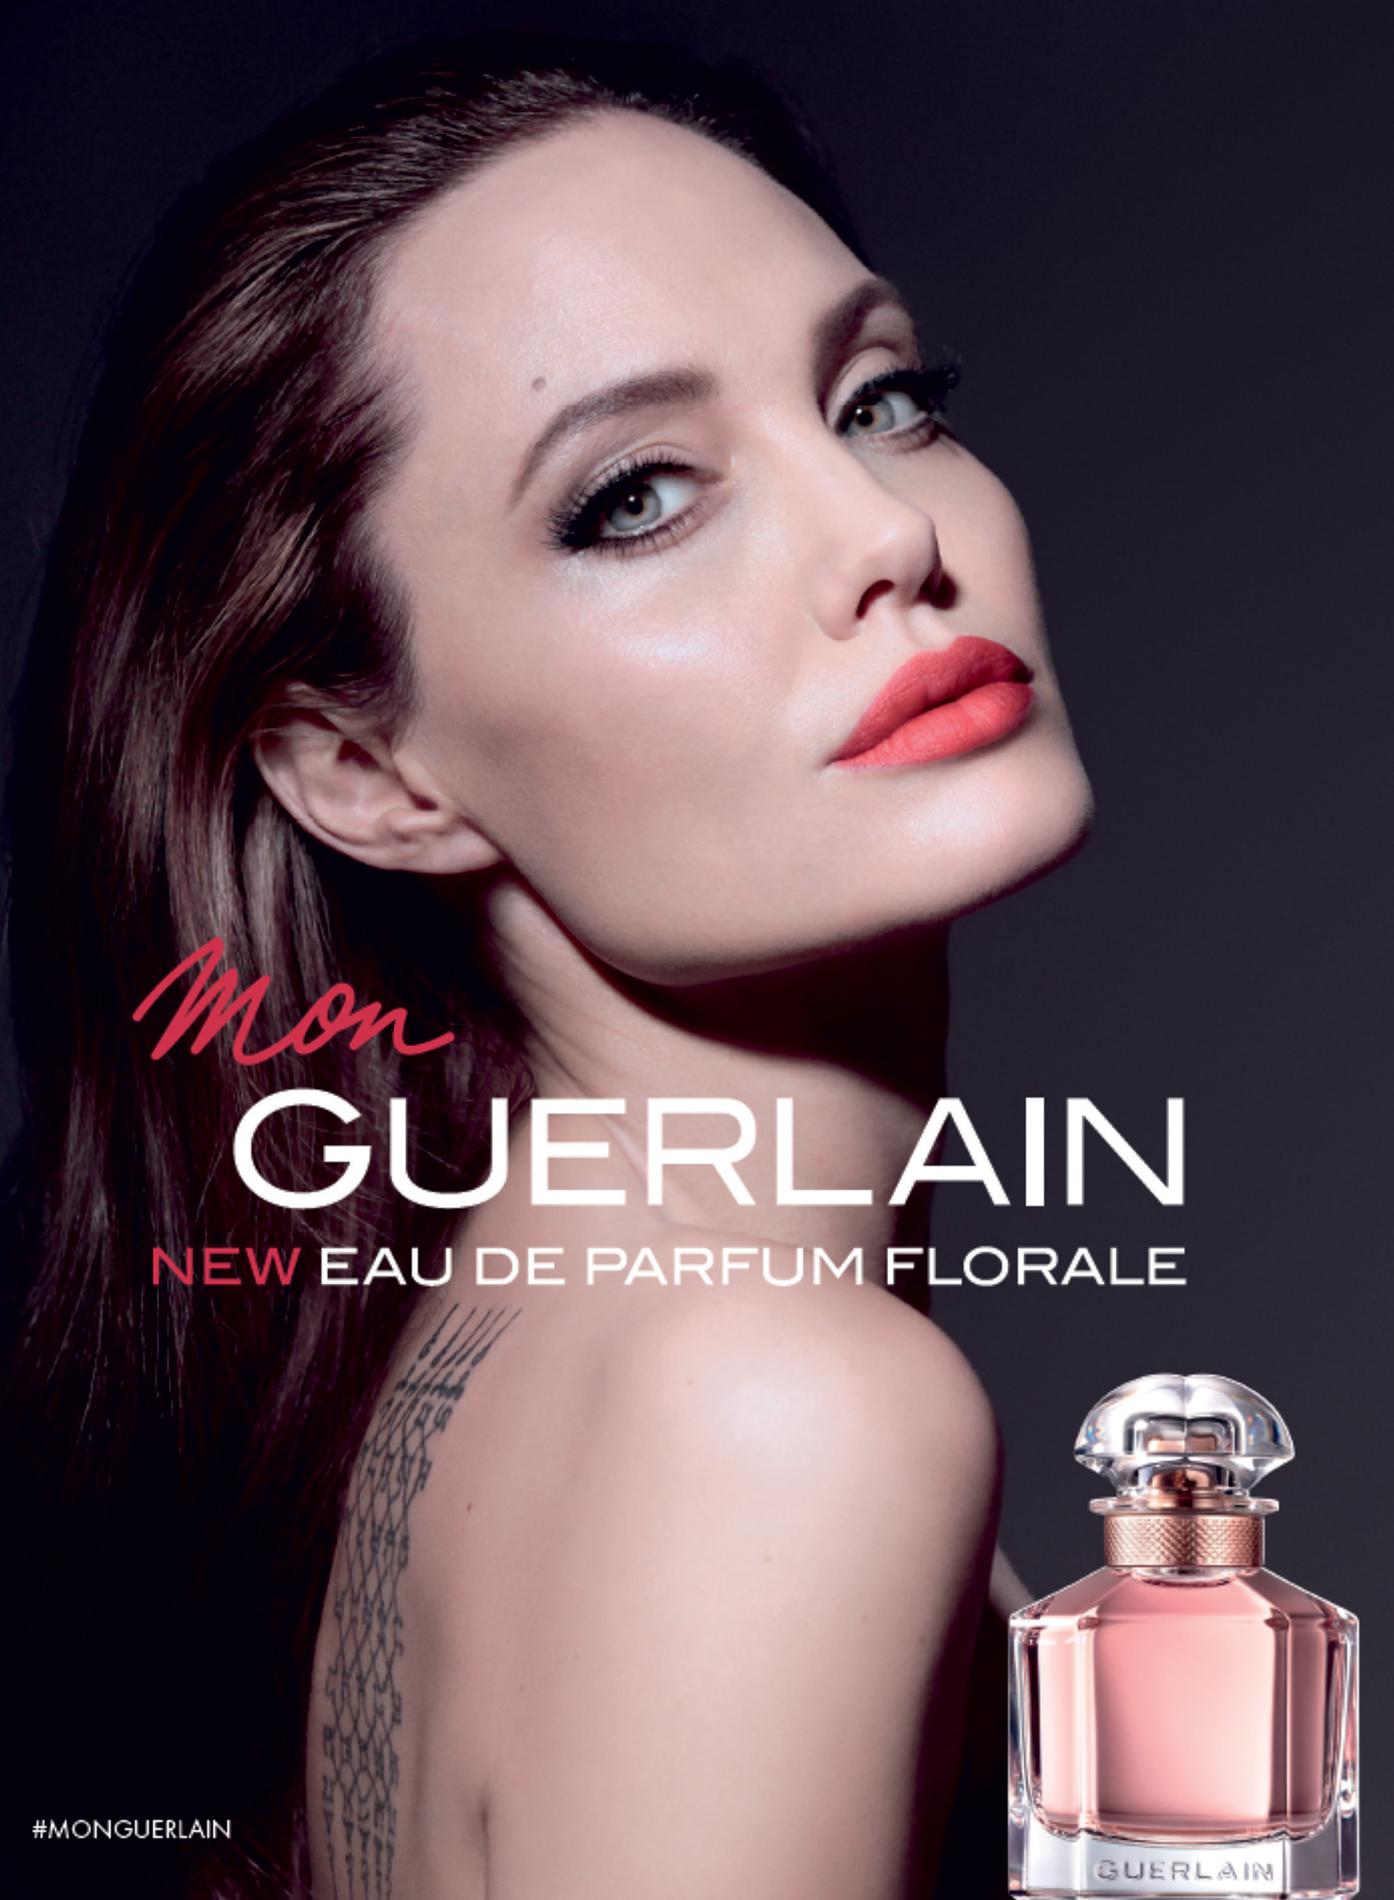 Guerlain: Mon Guerlain Eau de Parfum Florale ~ Nieuwe Geuren